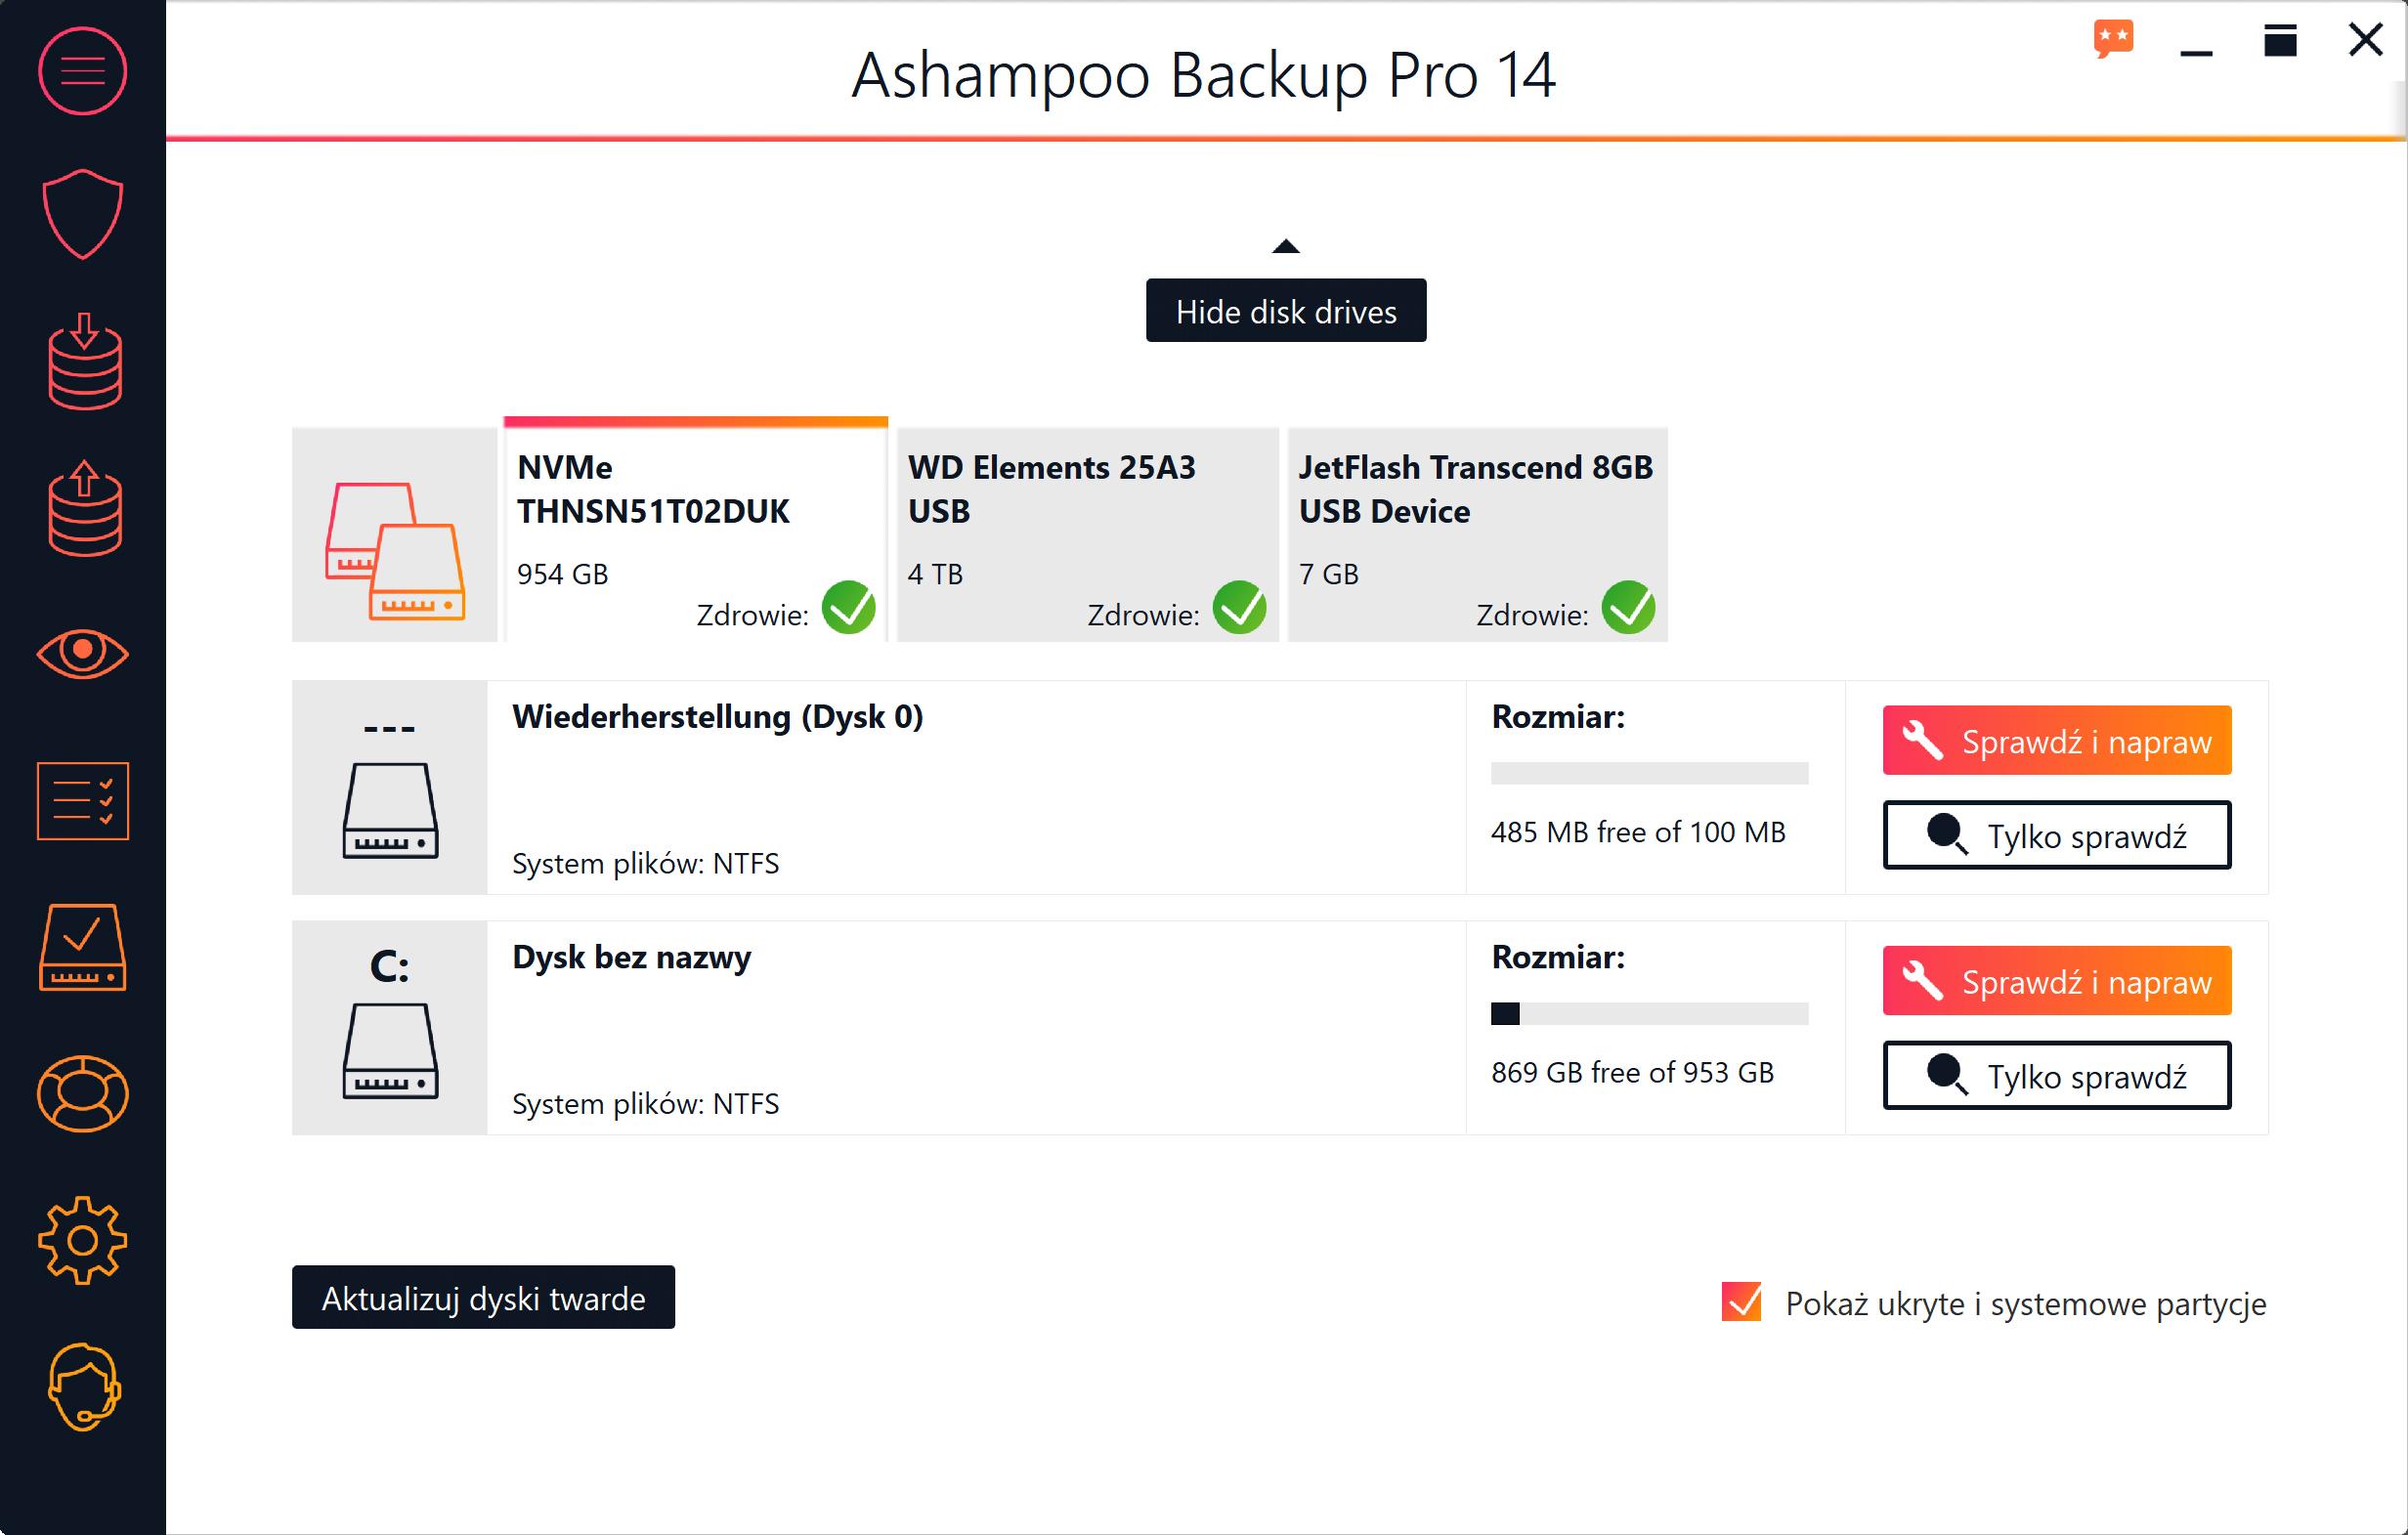 Screenshot interfejsu Ashampoo Backup Pro 14